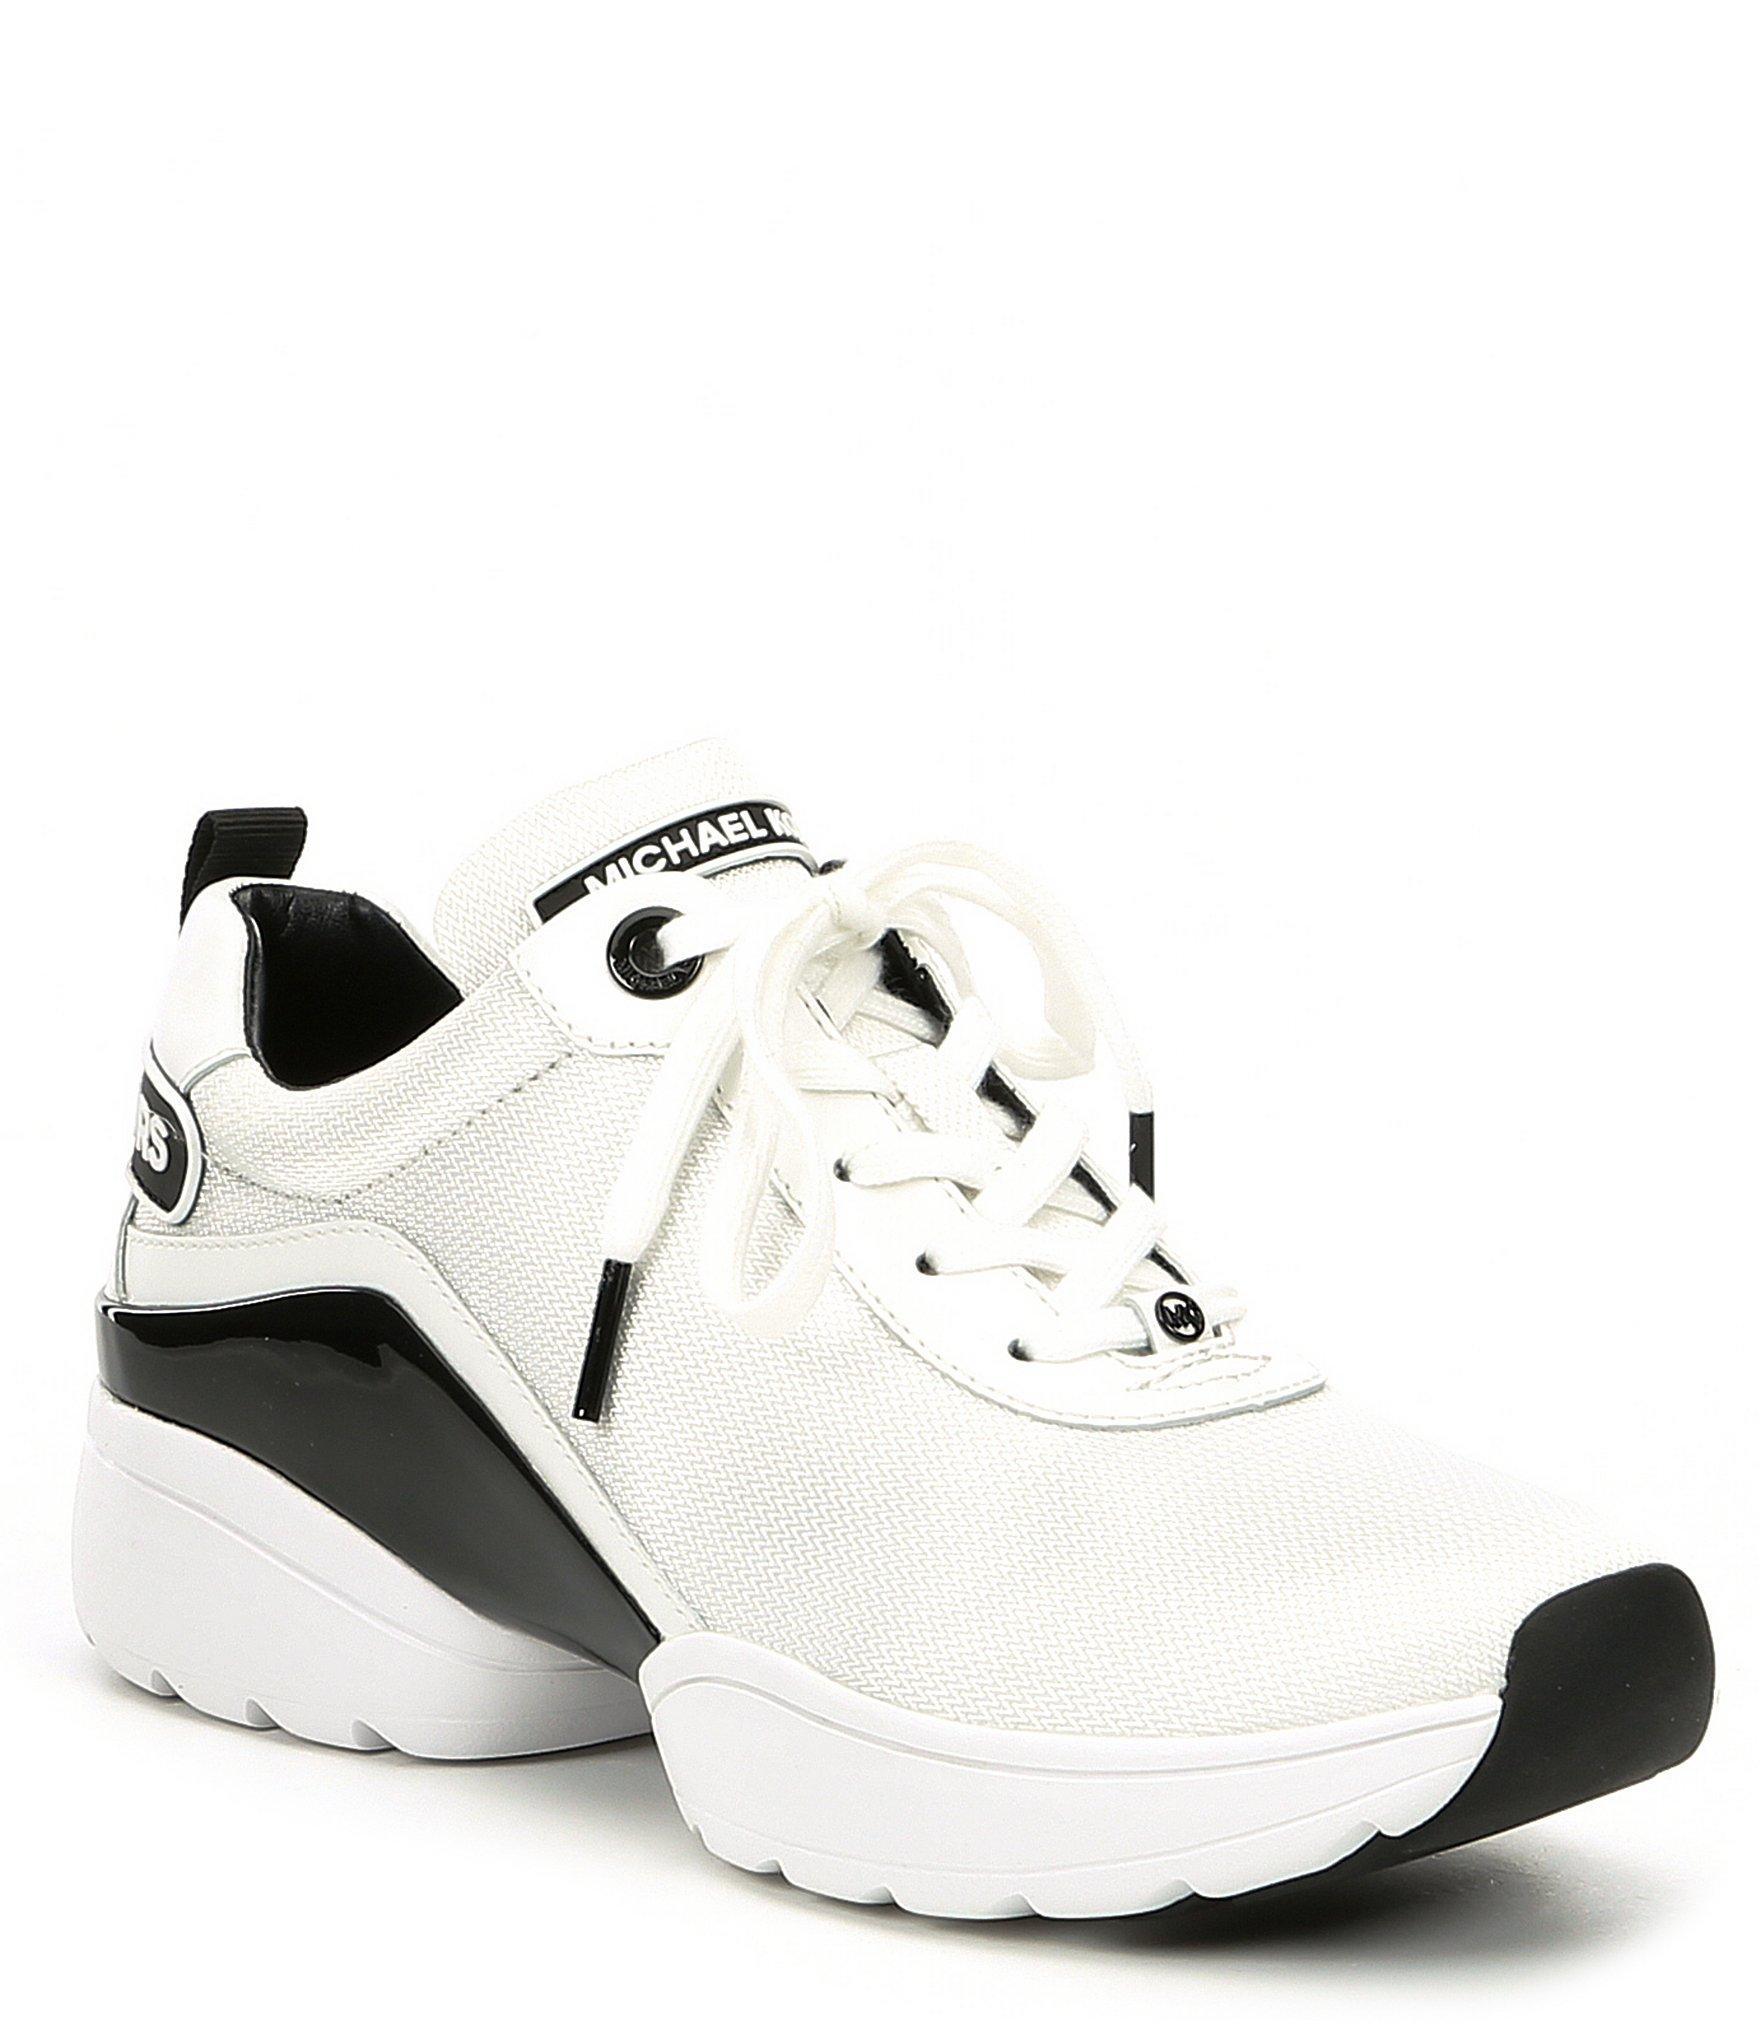 f4d14b73ffc8e Lyst - MICHAEL Michael Kors Jada Wedge Trainers in White